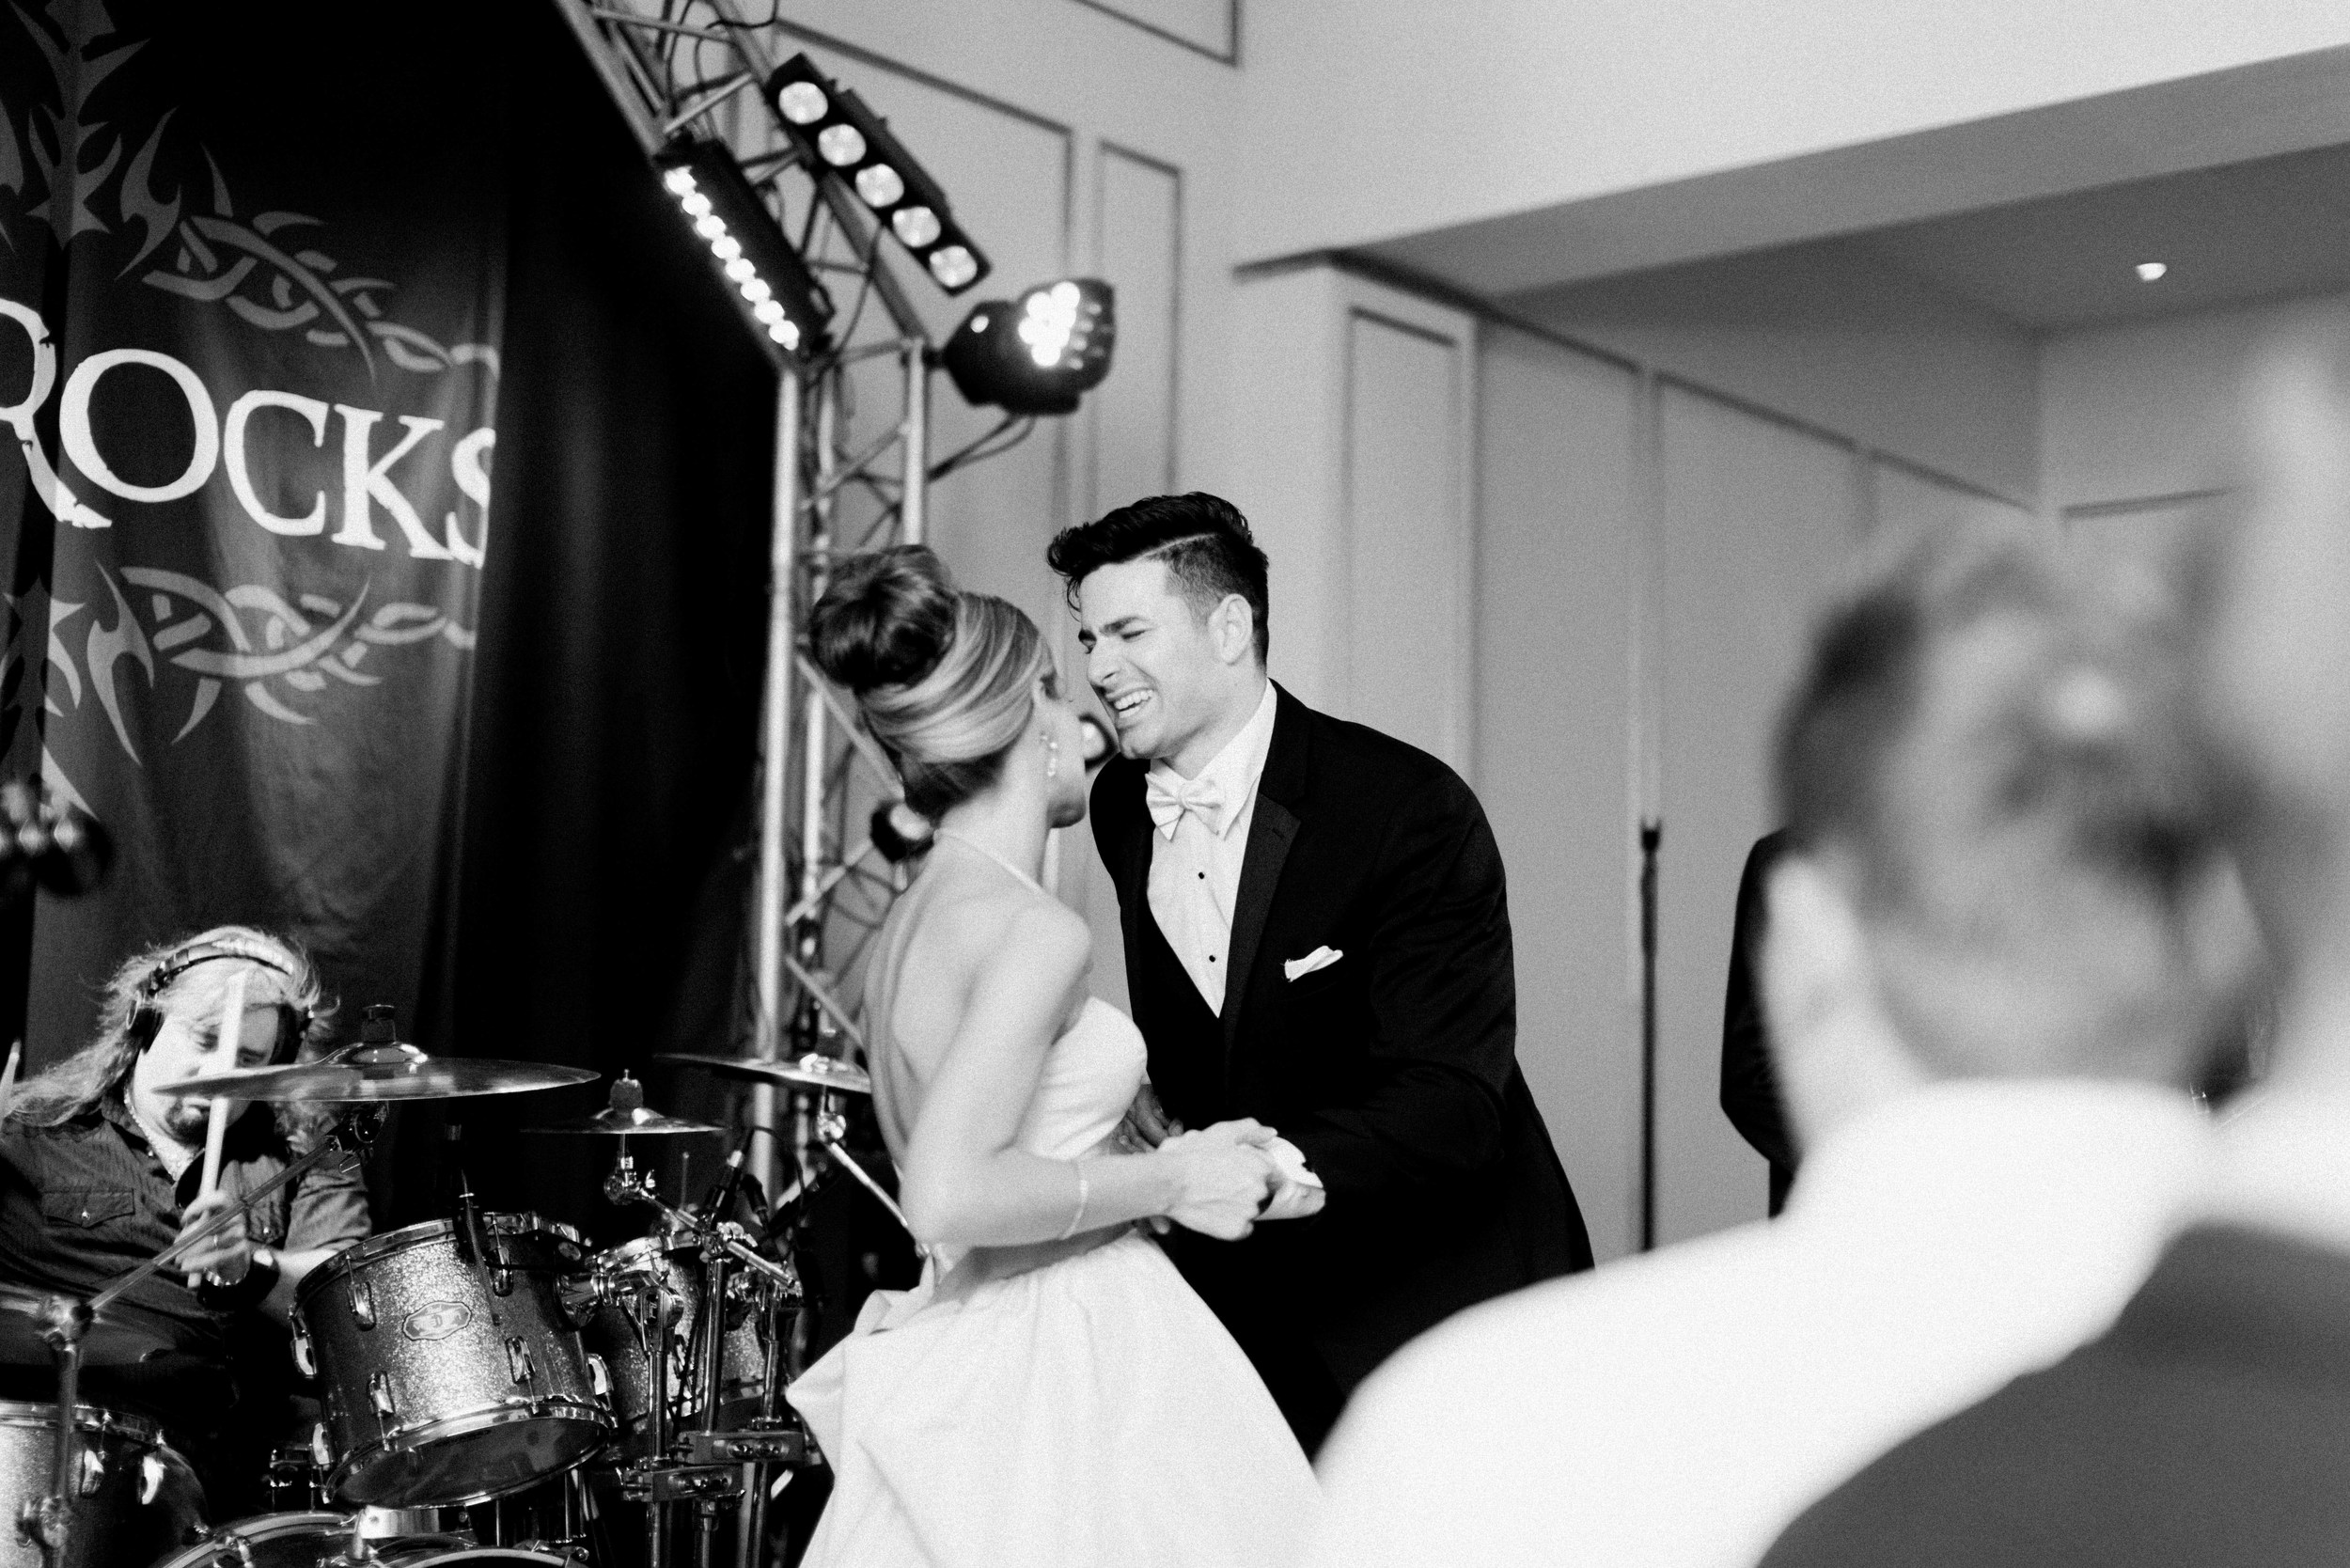 Dana-Fernandez-Photography-Houston-Wedding-Photographer-Style-Me-Pretty-Film-Texas-Destination-Photographer-46.jpg